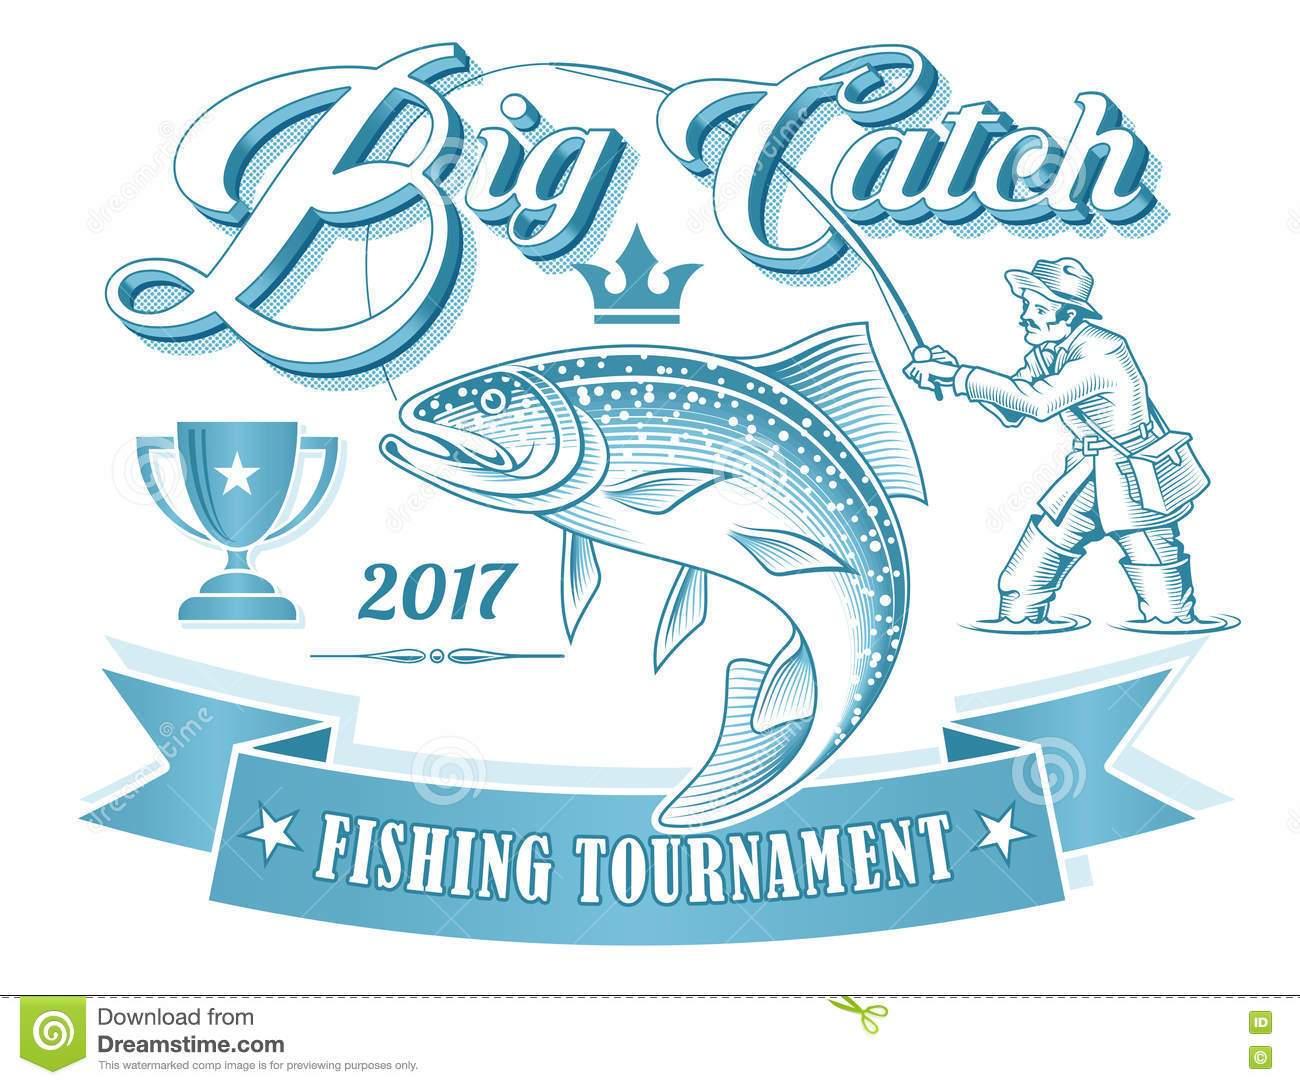 Fishing tournament clipart svg transparent Fishing tournament clipart 6 » Clipart Portal svg transparent